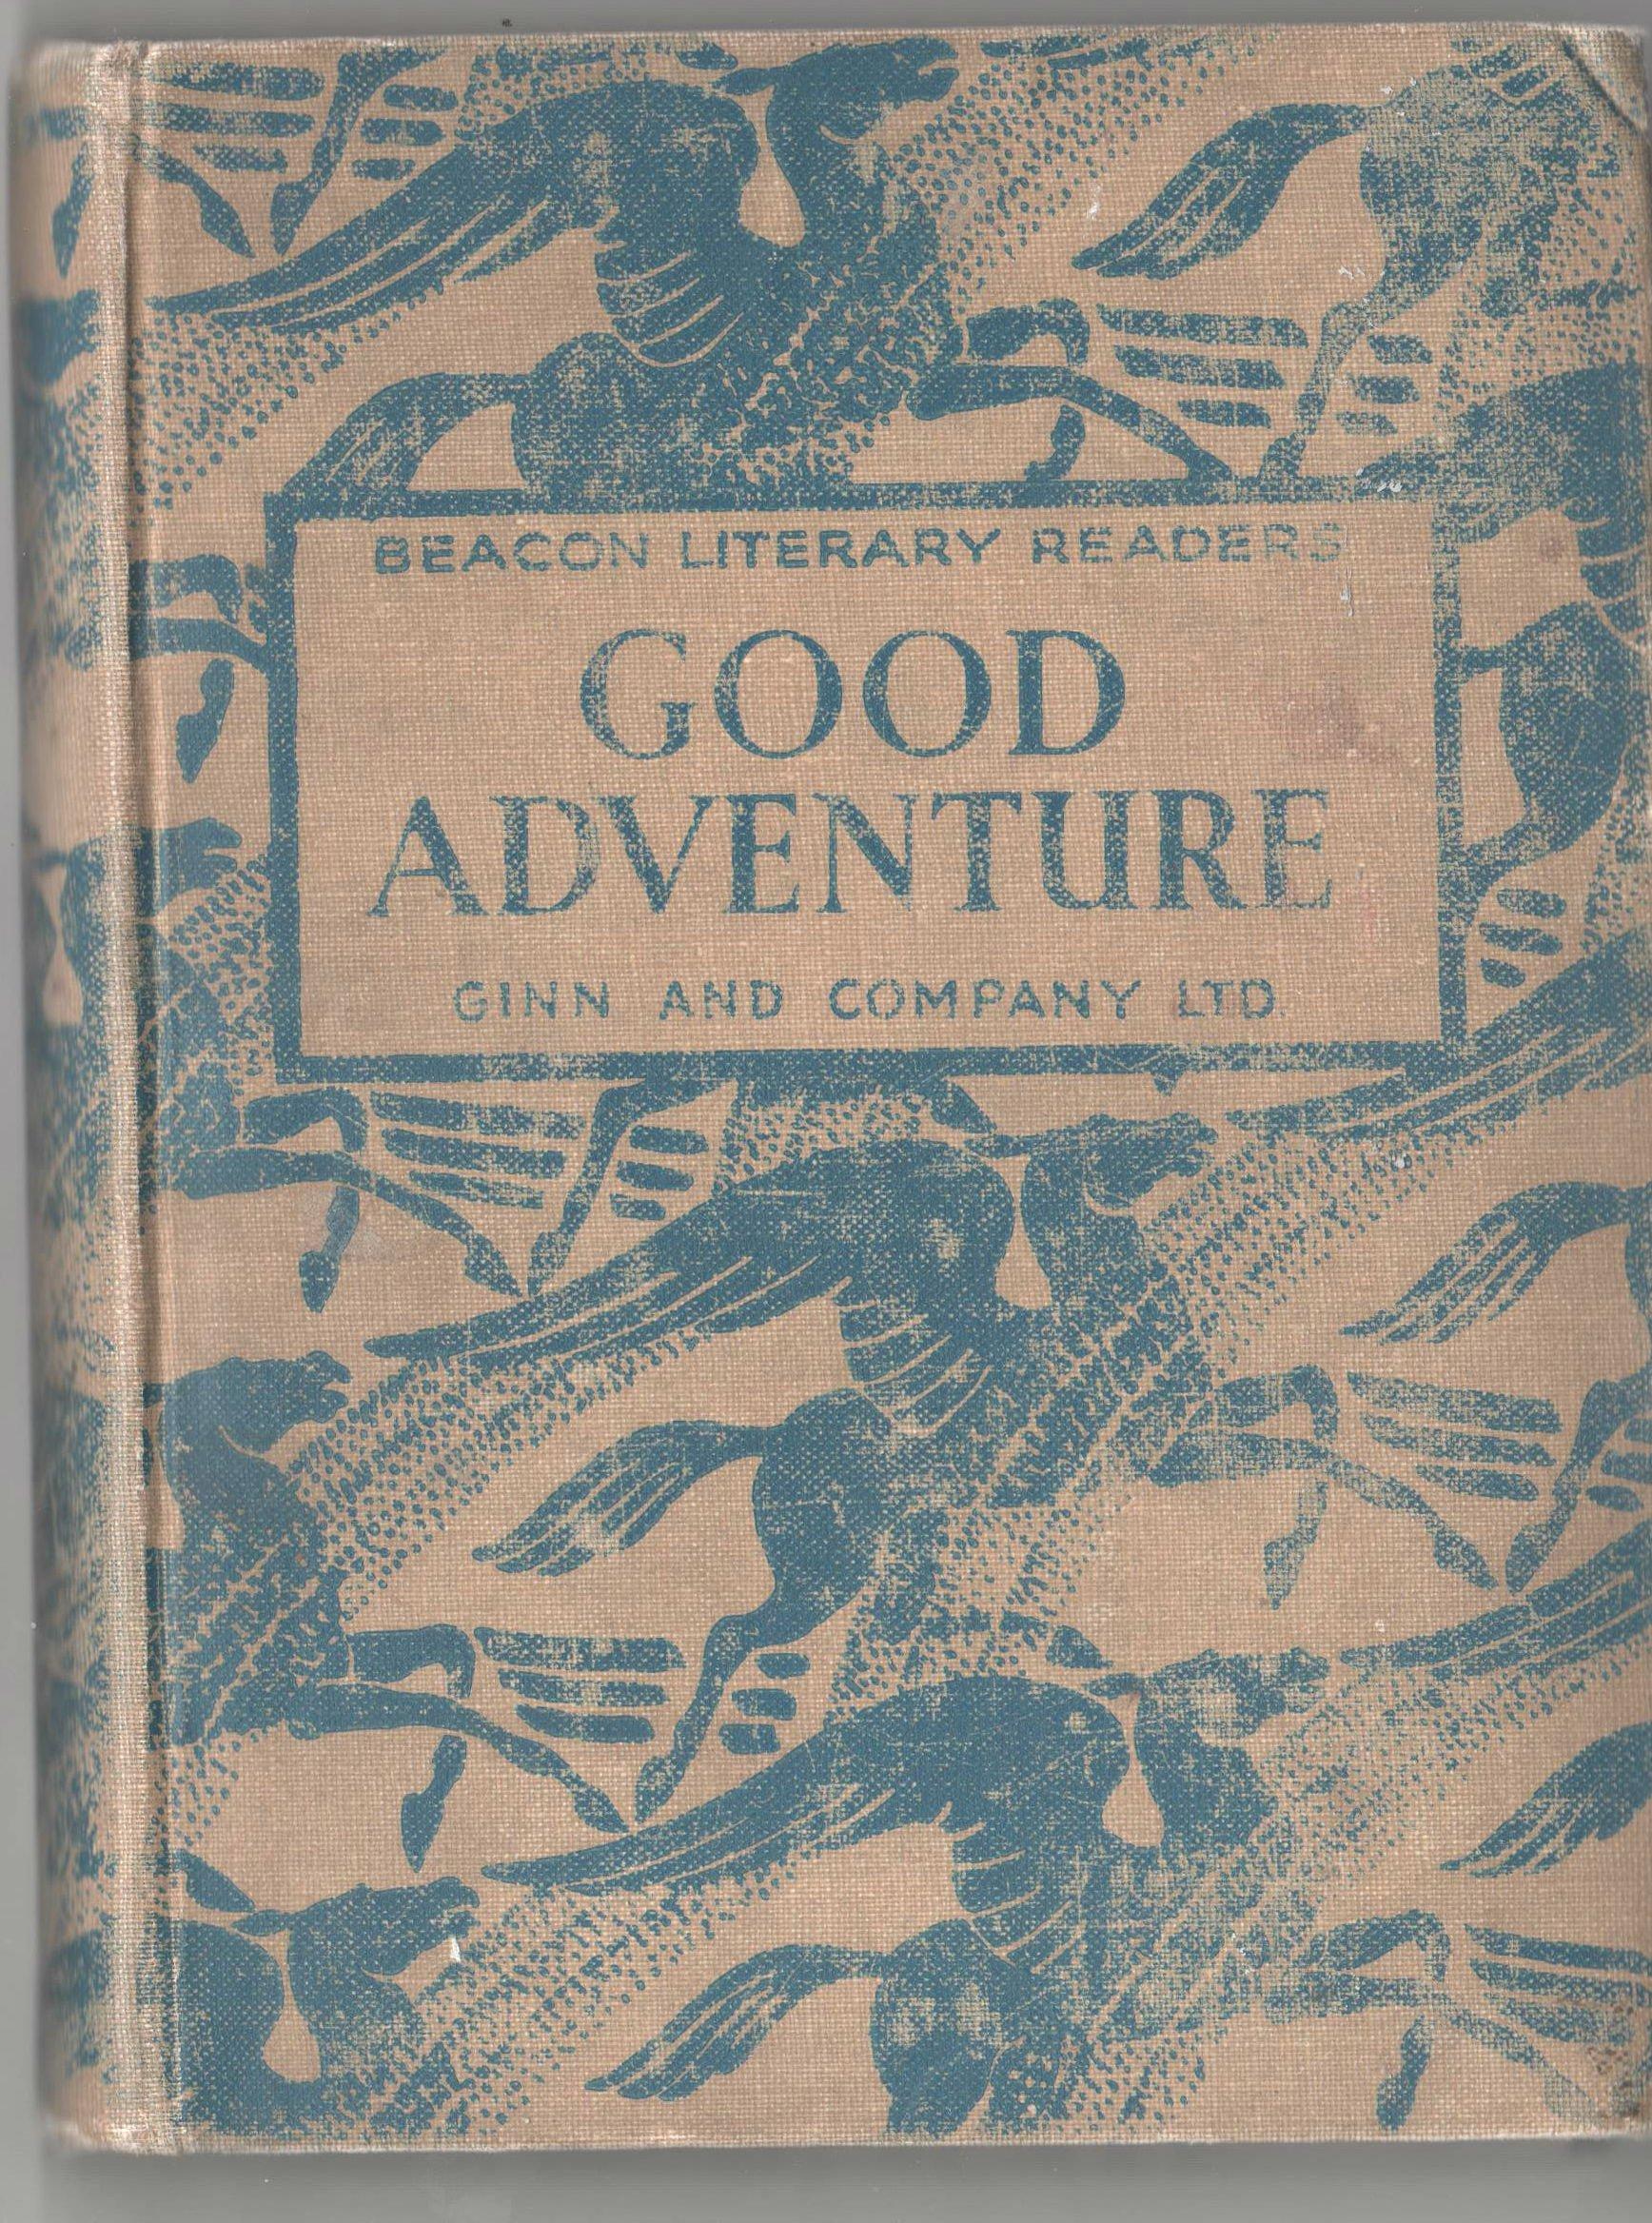 Beacon Literary Readers: Good Adventure Bk  5: Amazon co uk: J